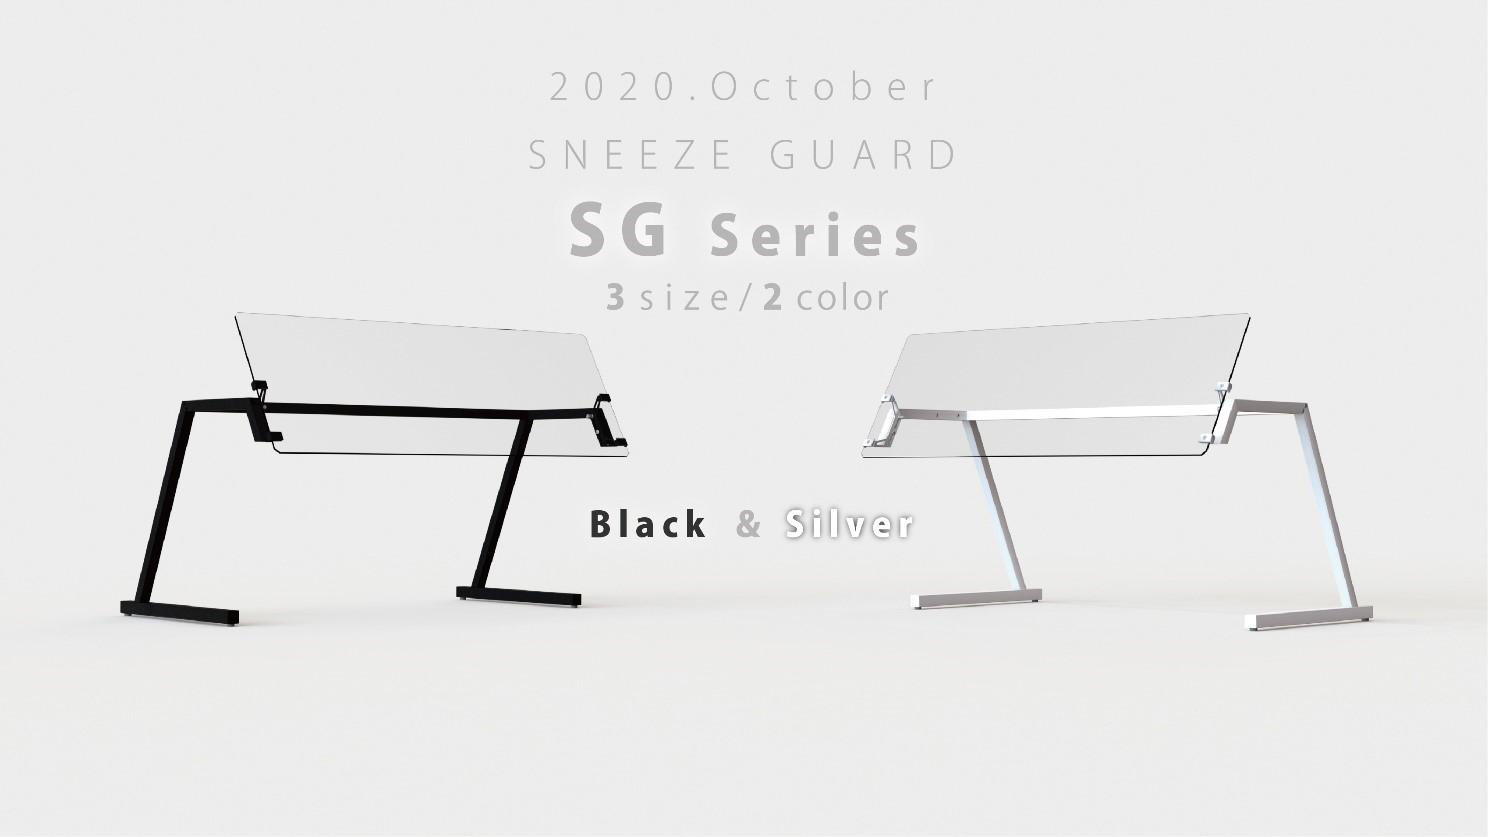 SG-680